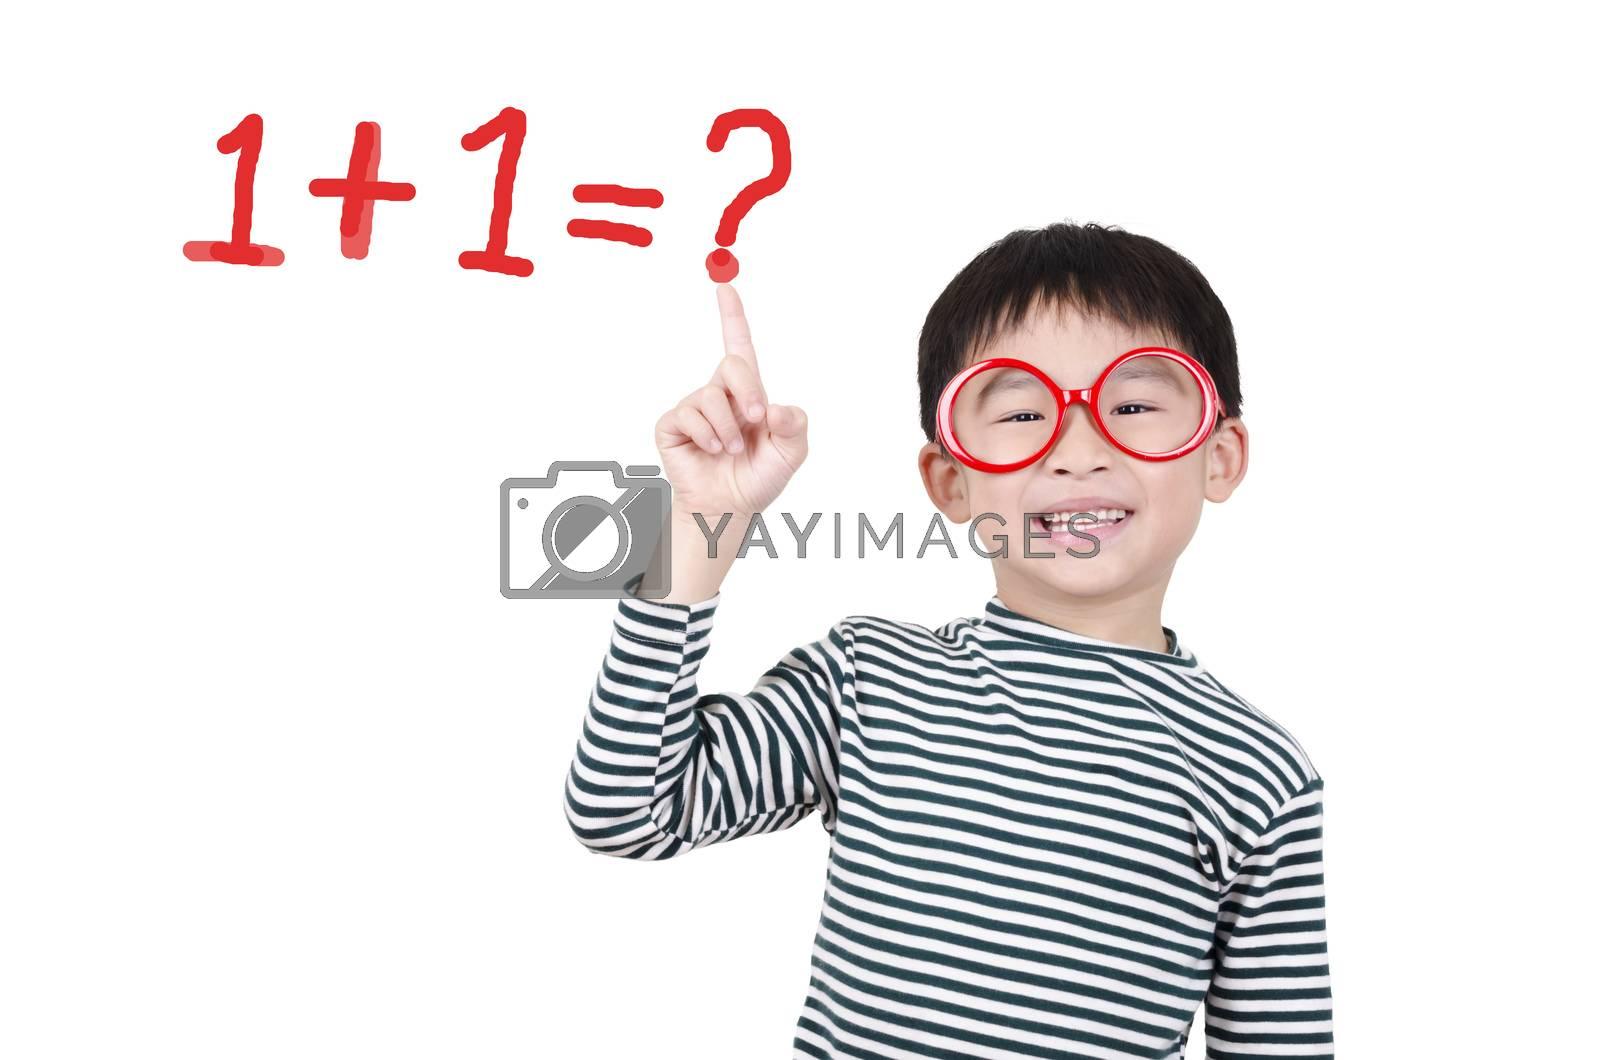 Royalty free image of Smart cute boy thinking by FrankyLiu